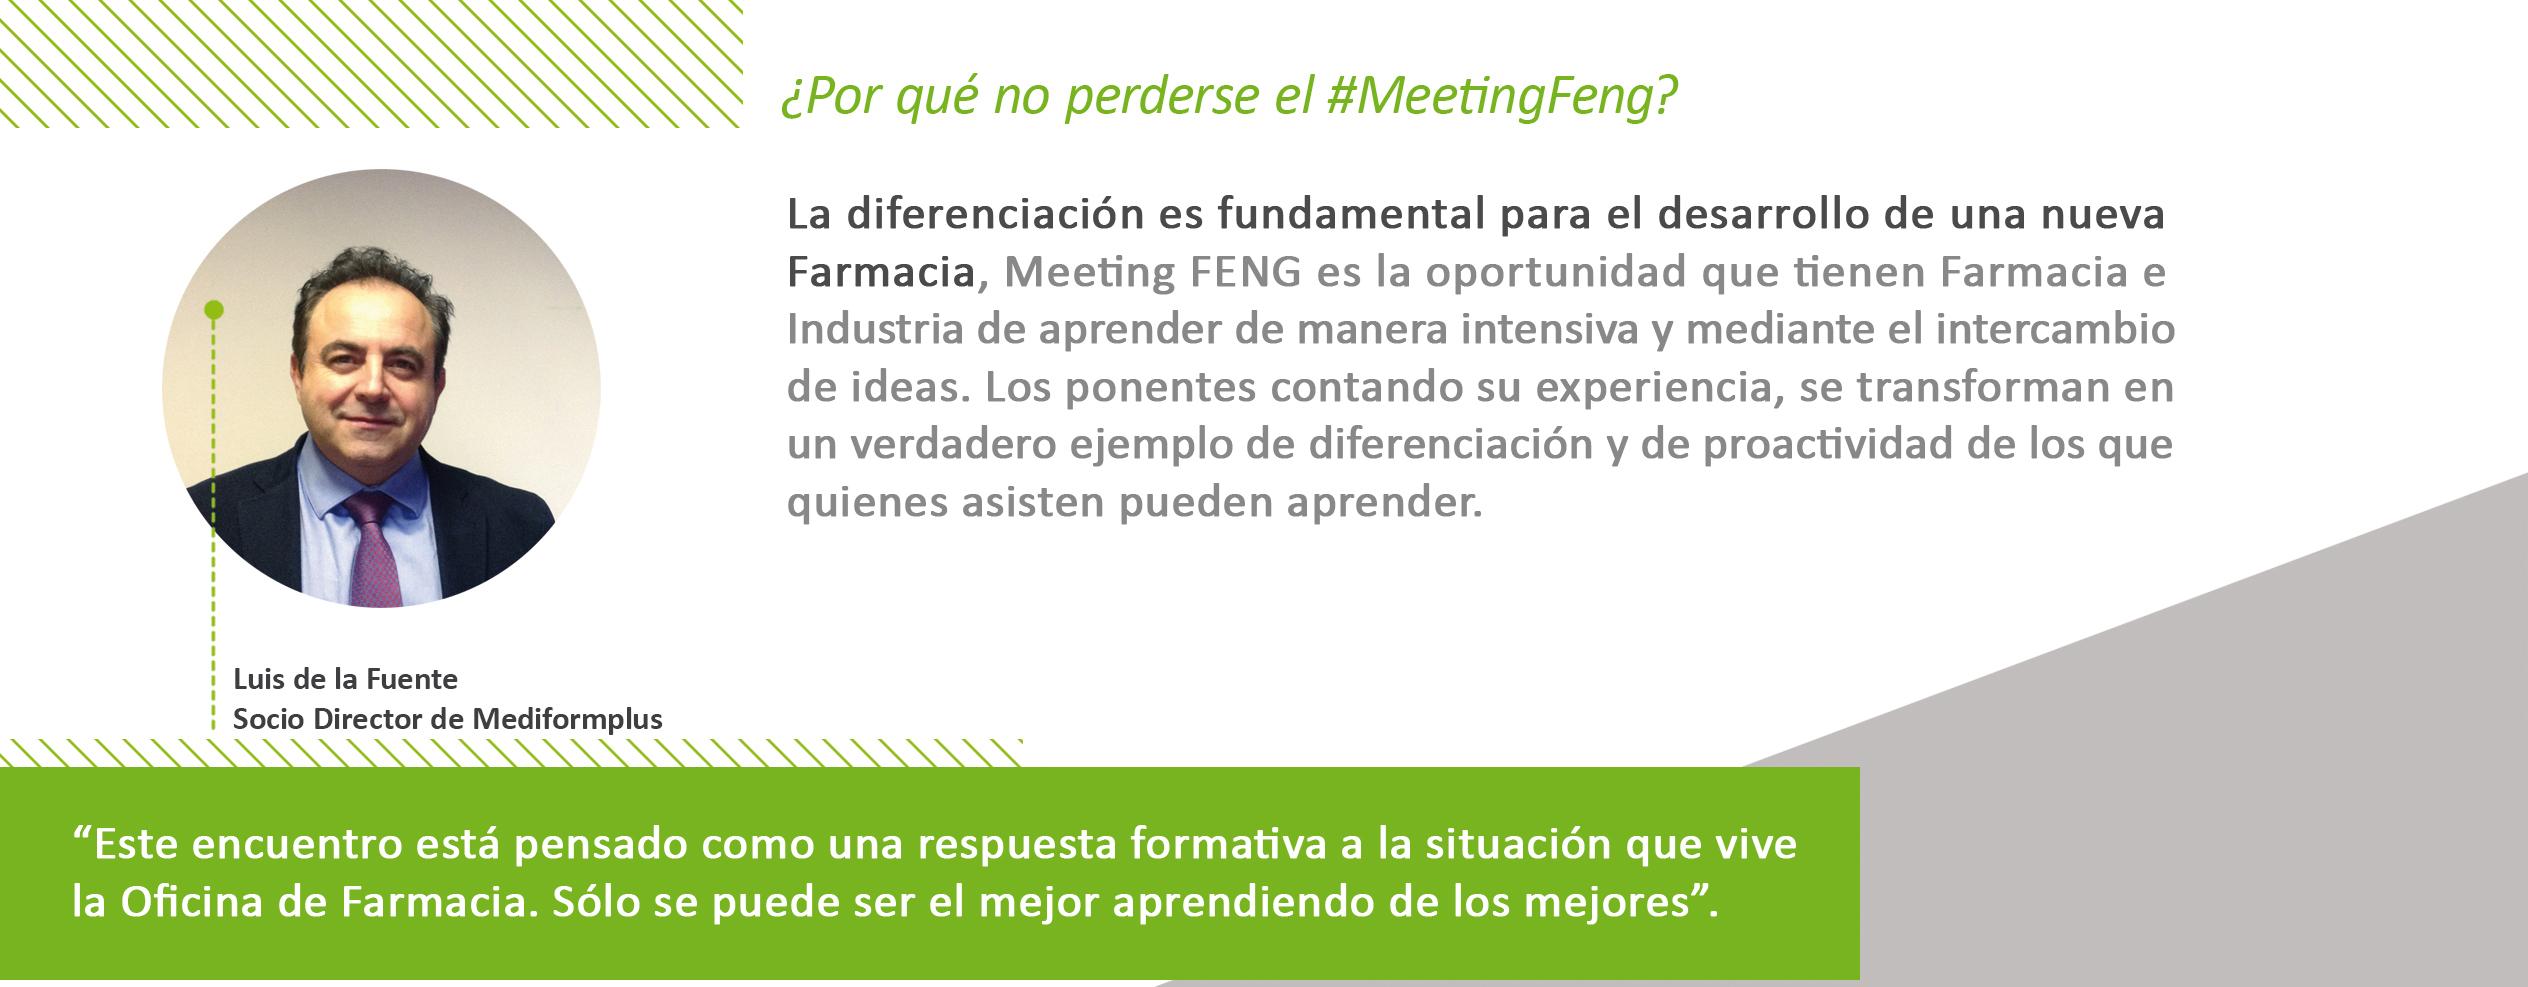 http://saboresmasquegolf.com/wp-content/uploads/2015/11/Sabores-mas-que-golf-meeting-feng-de-la-oficina-de-Farmacia-5%C2%BA-edicion-eventos-Madrid-Footer.jpg